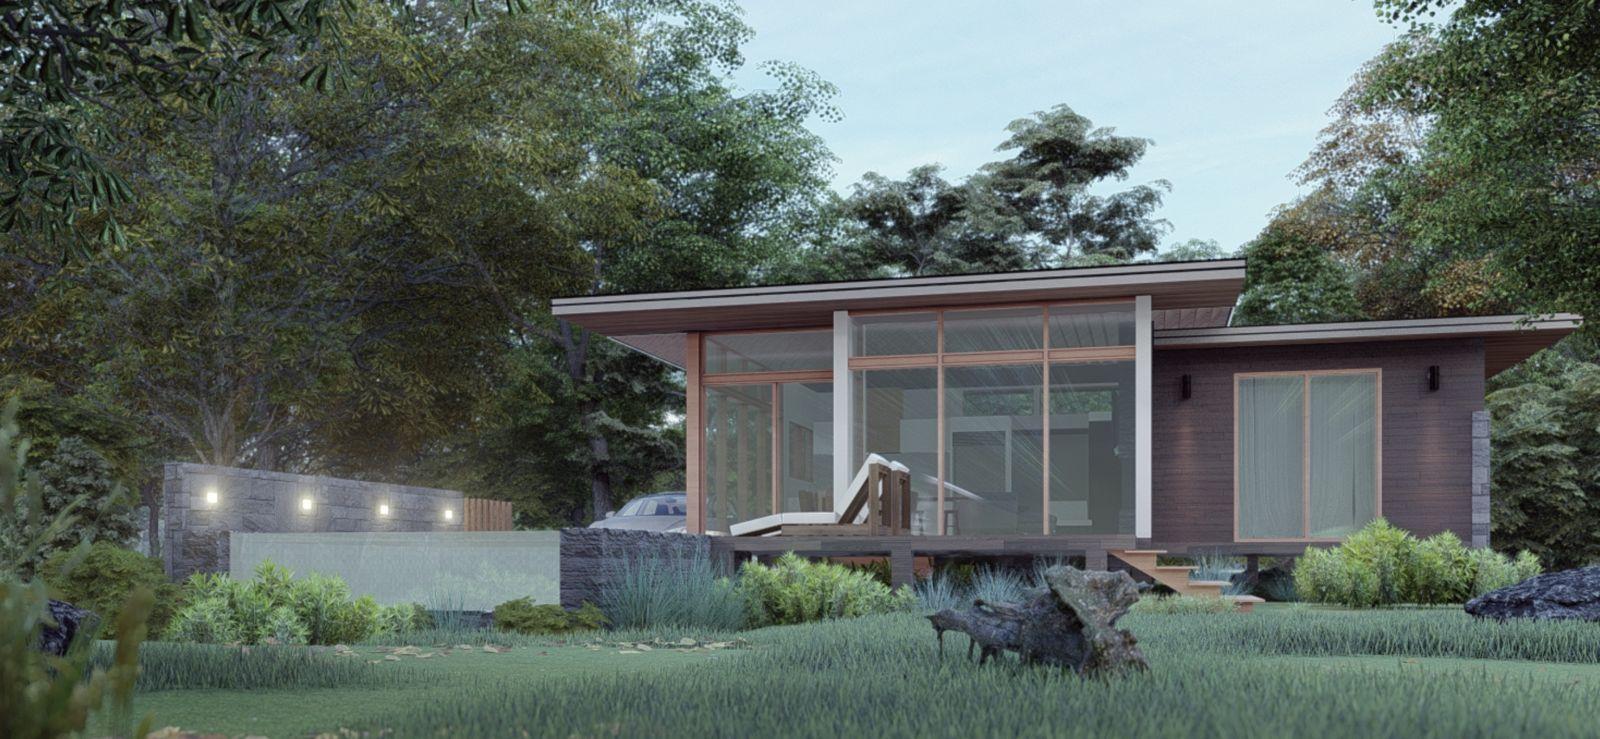 3 bedroom house in sustainable development